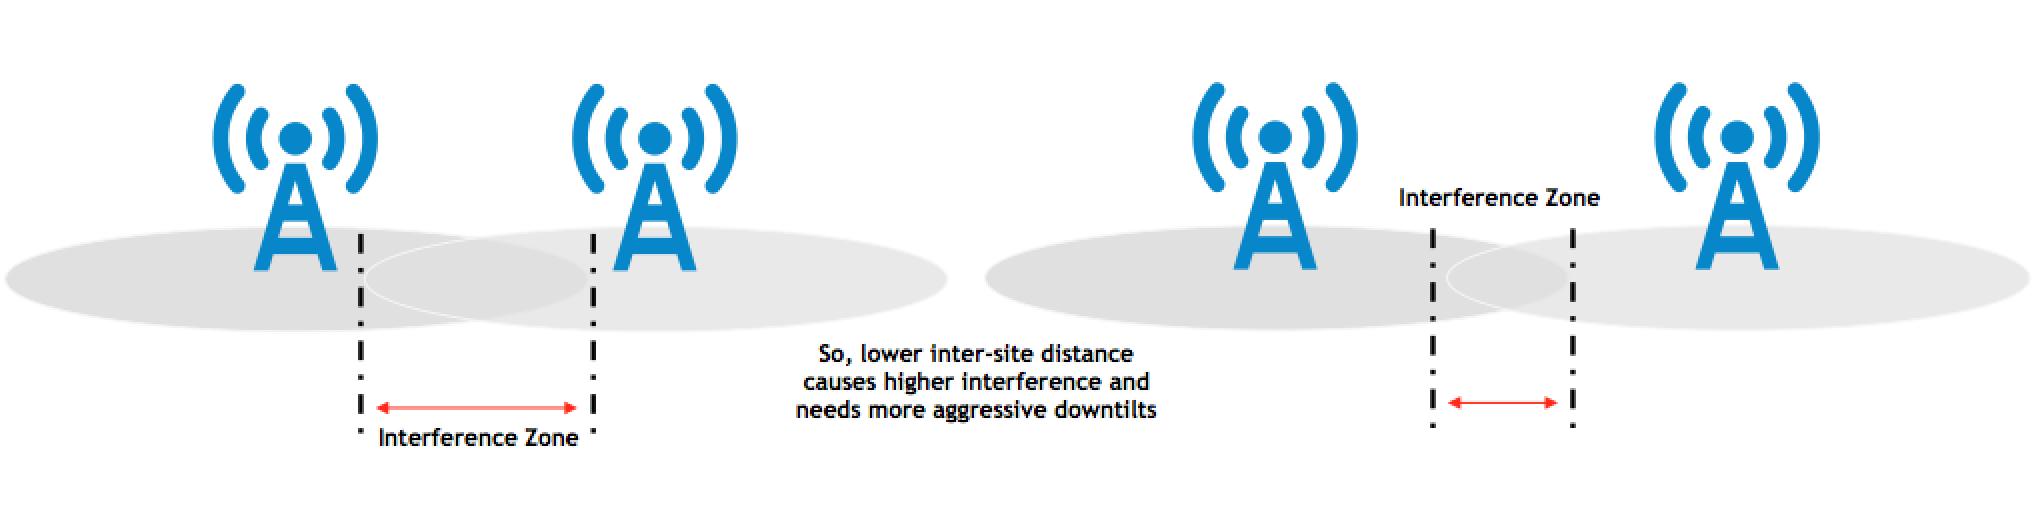 LTE Throughput Optimization: Part 2 - Spectral Efficiency